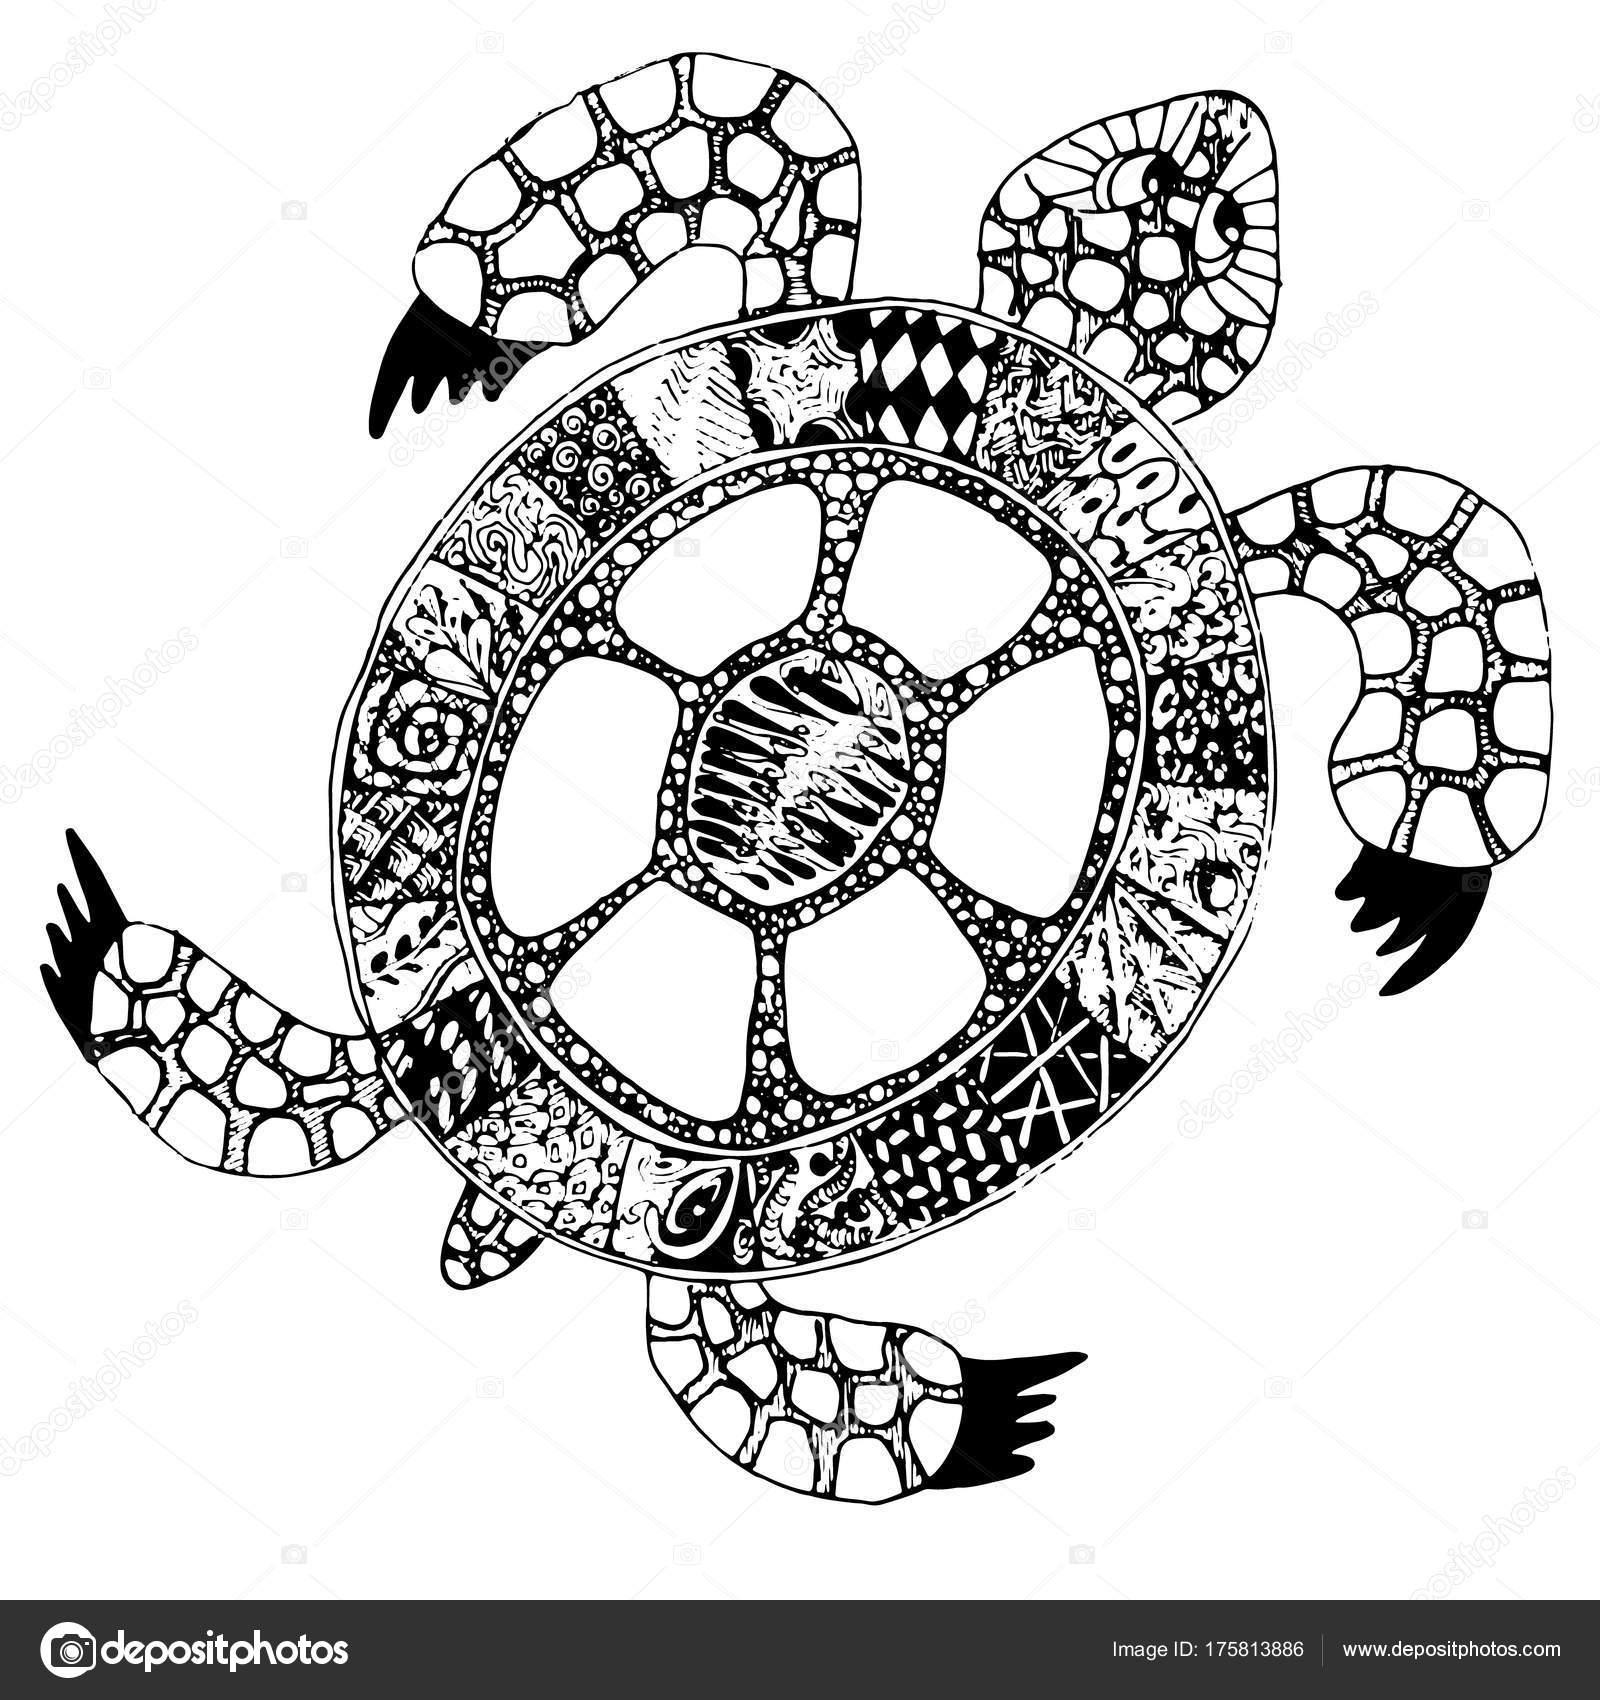 Silueta De Tortuga Para Imprimir Tortuga De Doodle Dibujado Mano